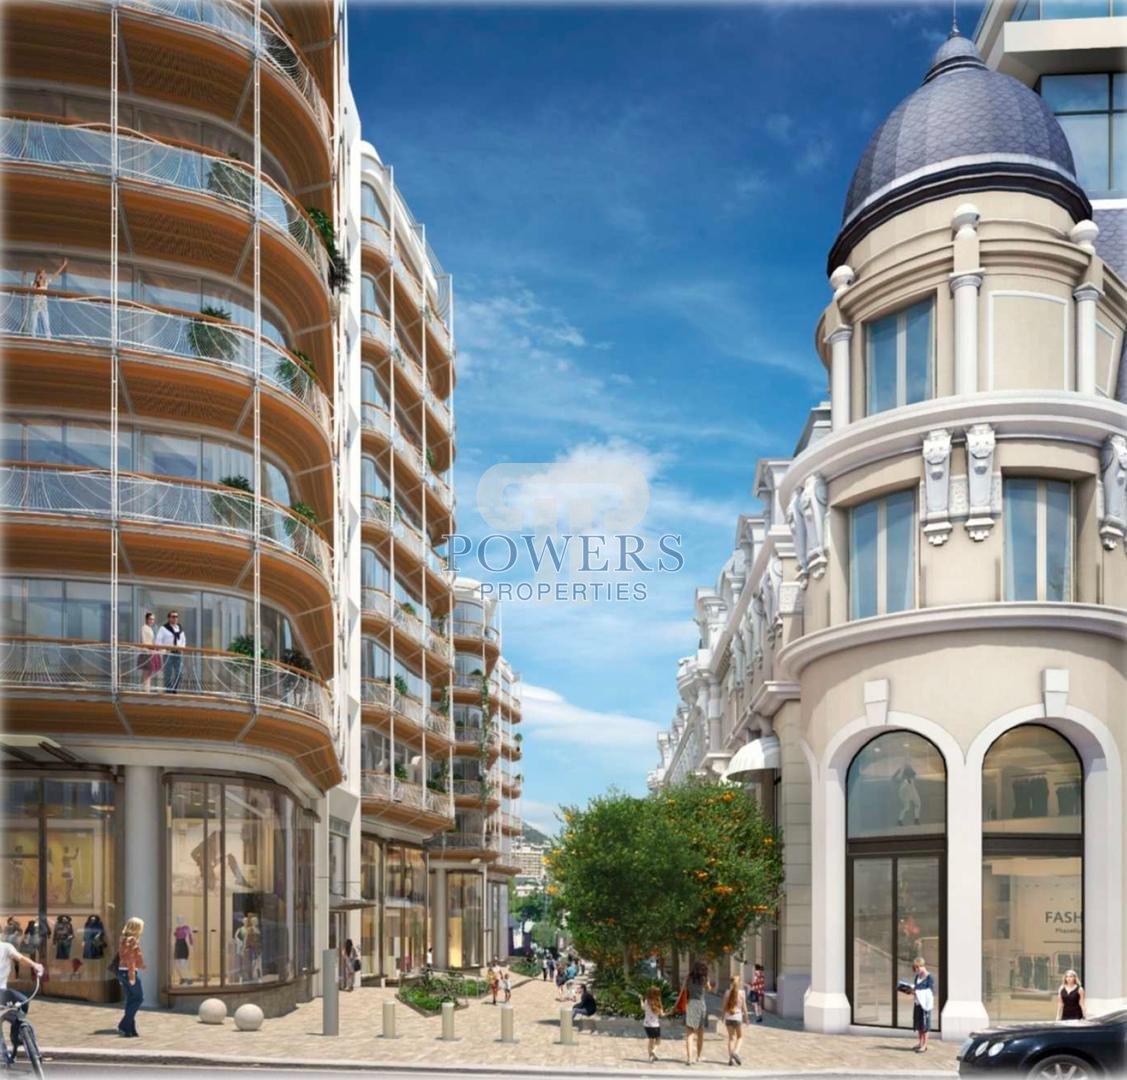 Monte Carlo Apartments: Rental Powers Properties REAL ESTATE AGENCY MONACO Carré D'Or